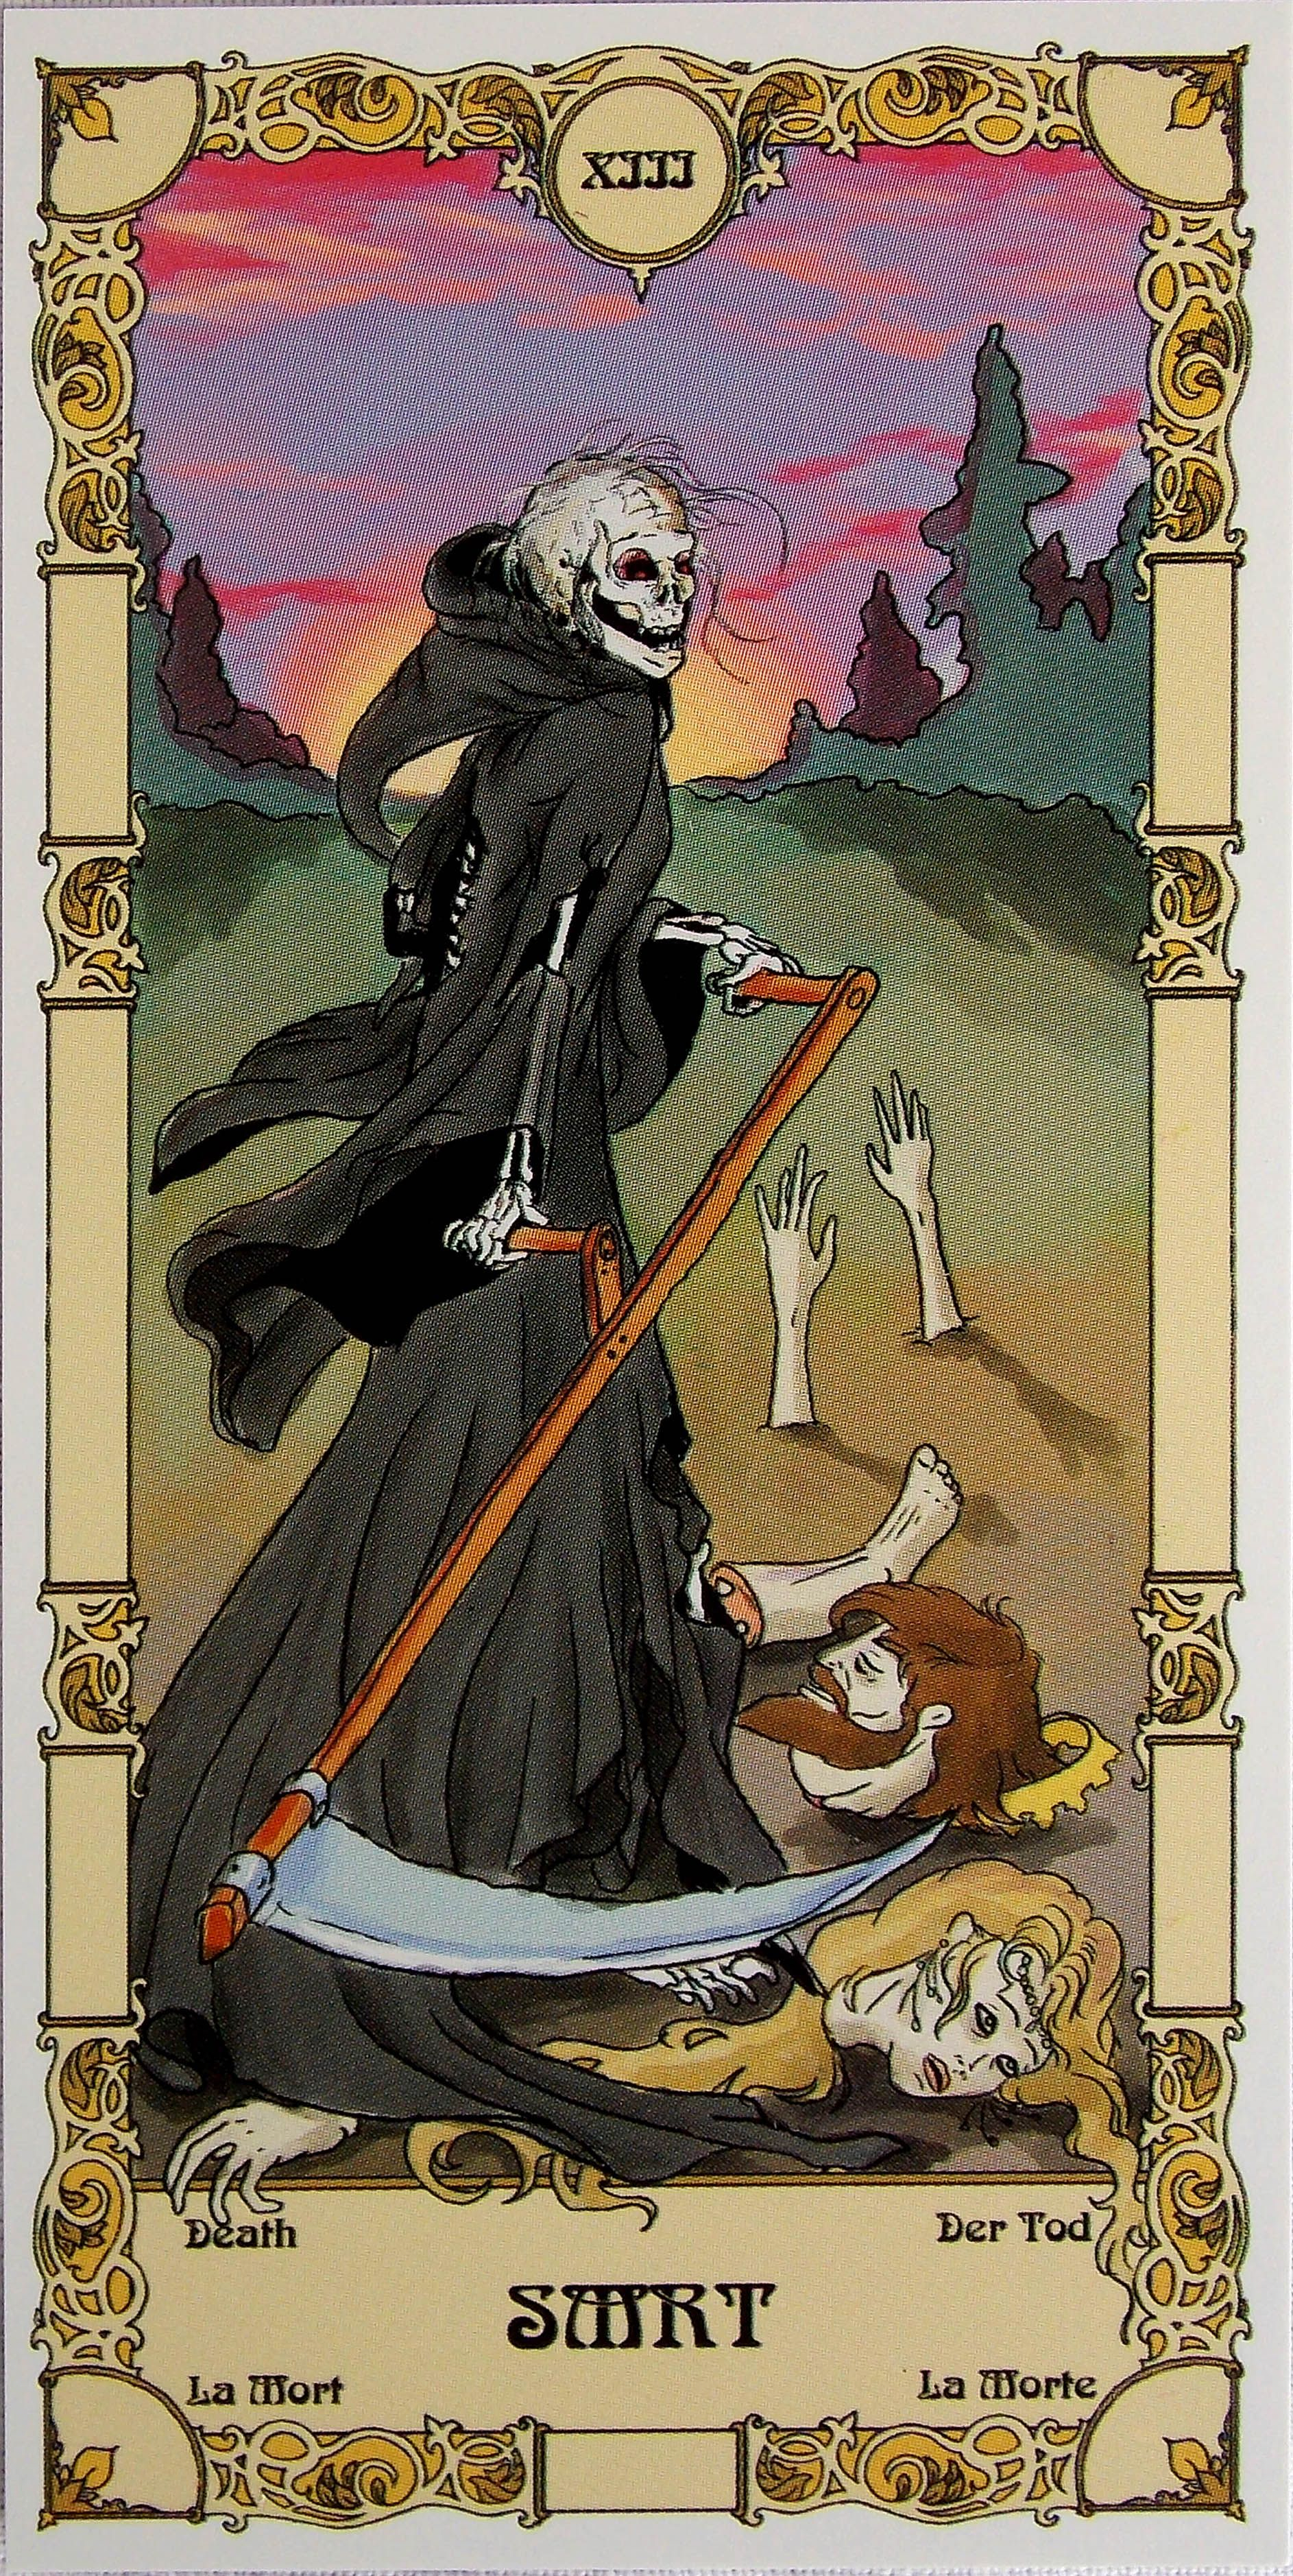 Major Arcana Tarot Card Meaning According To: Czech Grand Arcana Tarot. Major Arcana/22 + 2 Blank Cards